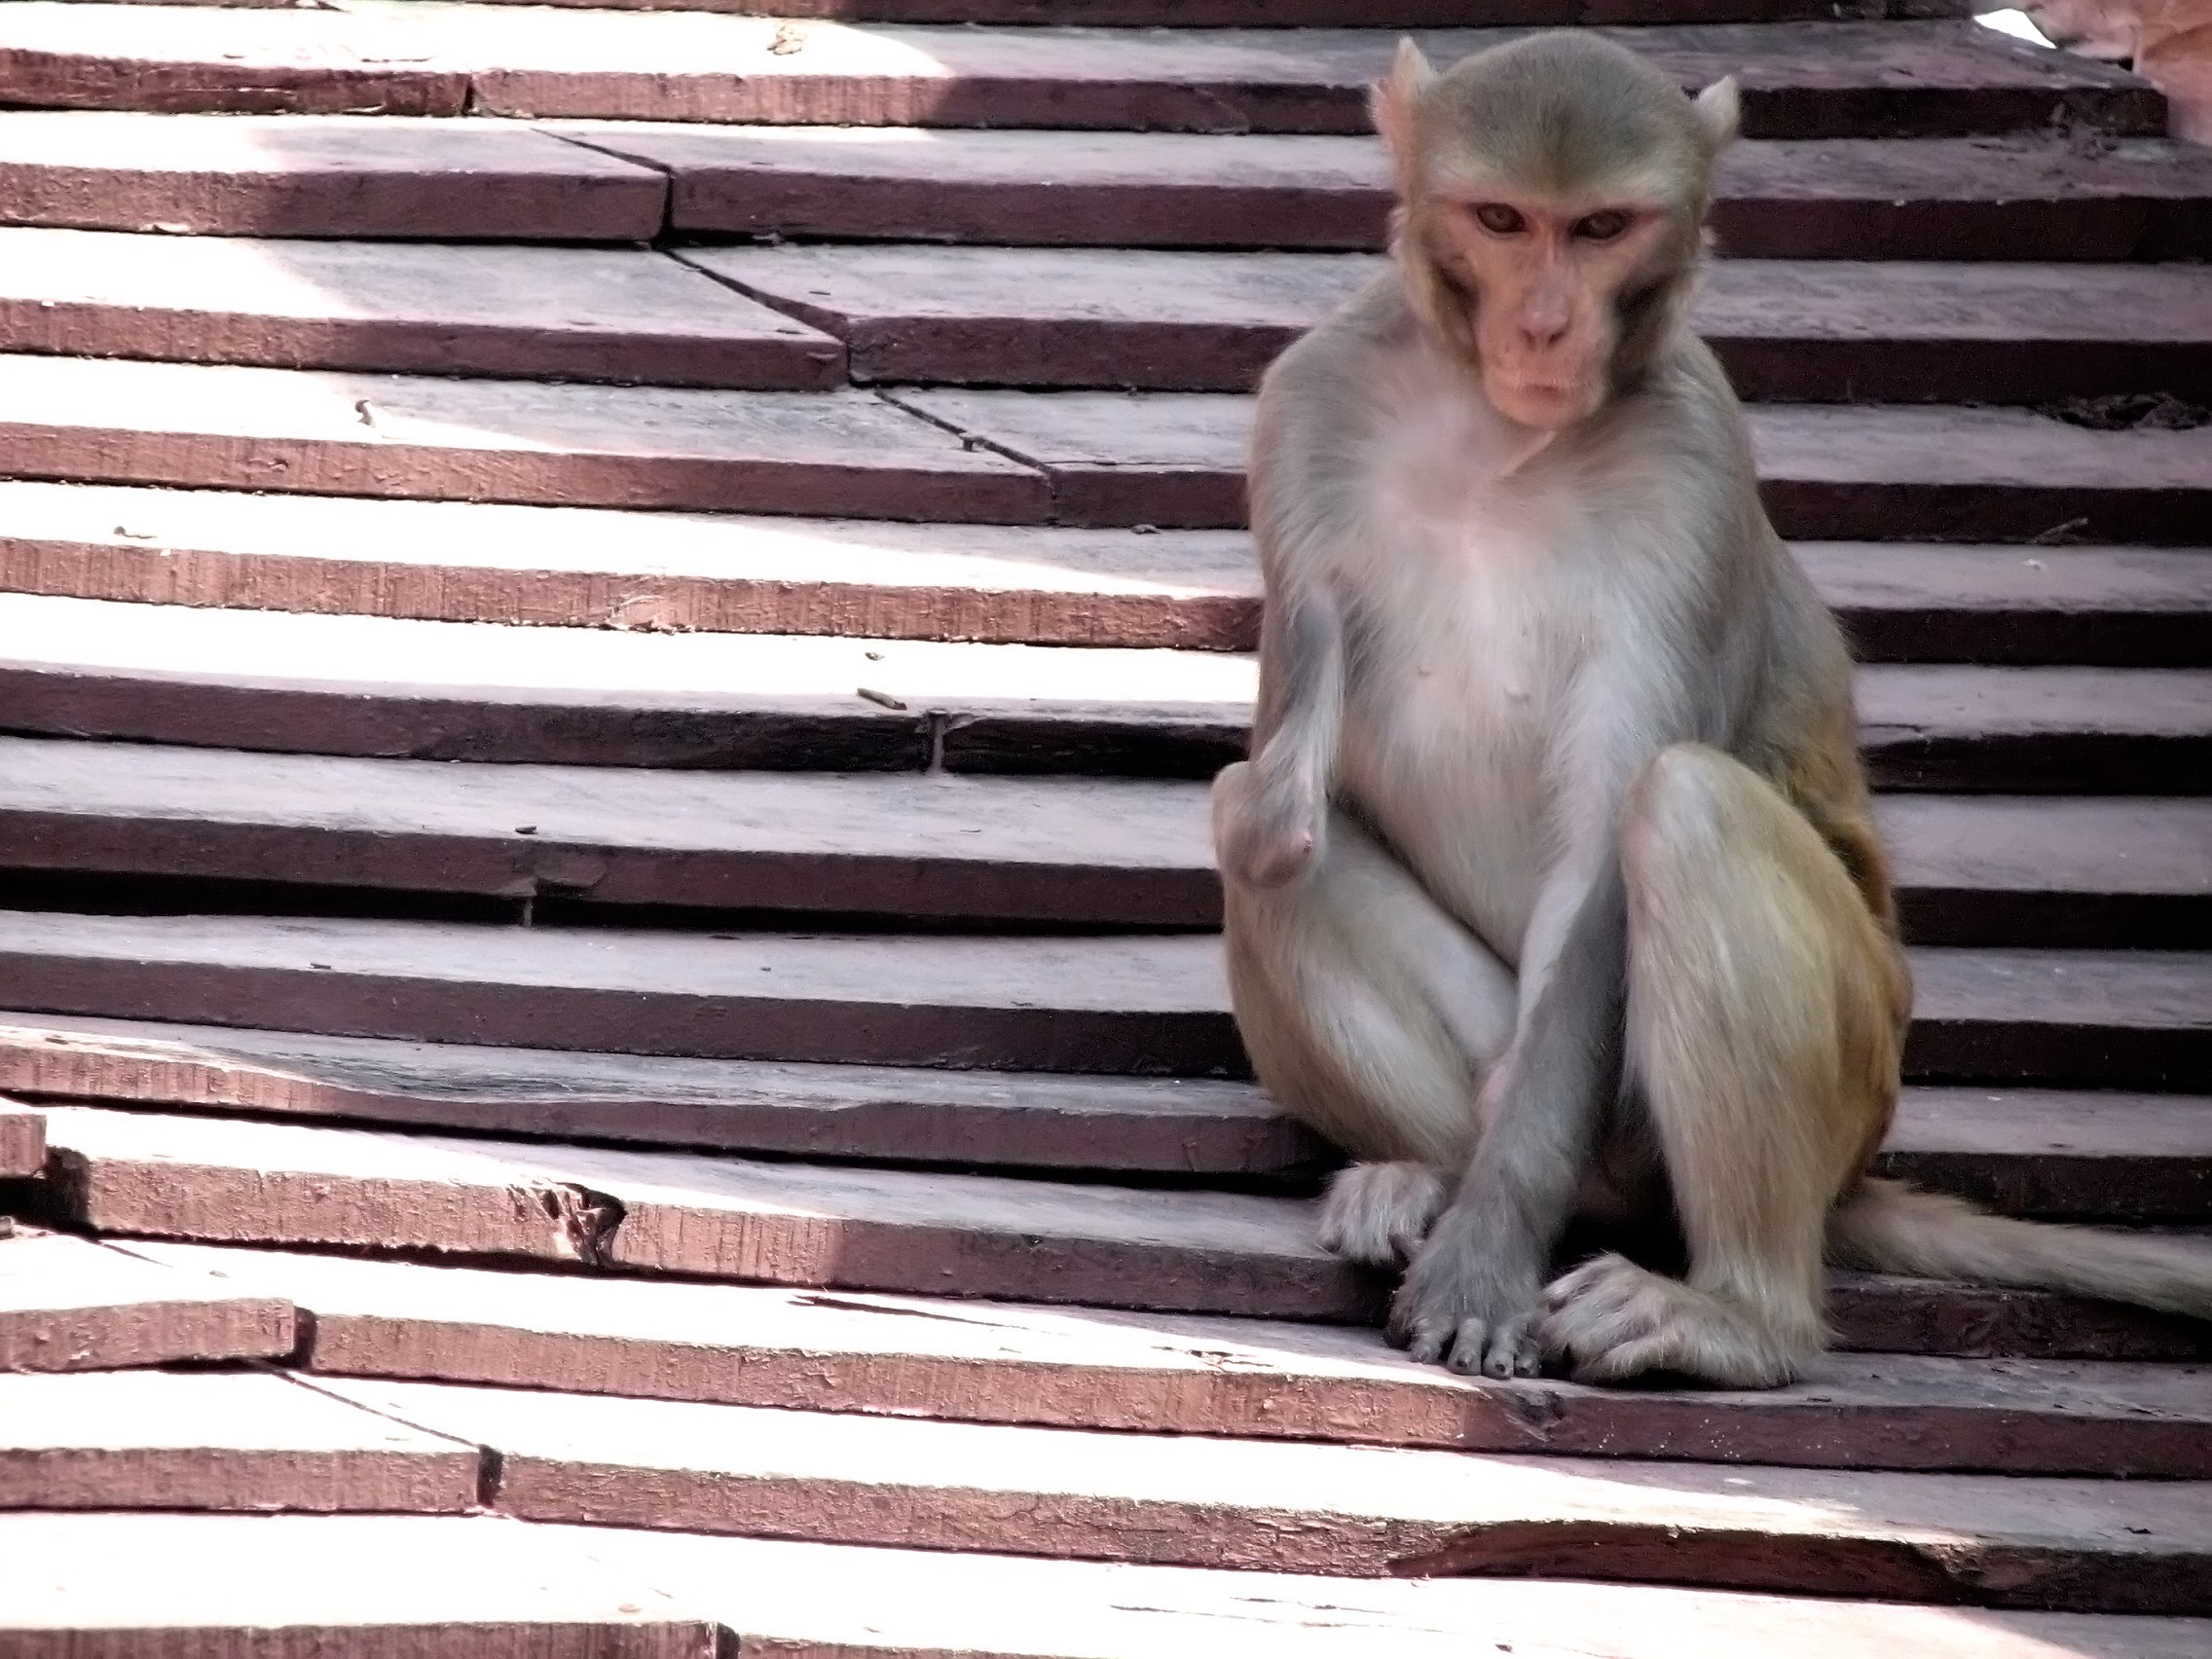 Handicapped Monkey, Animal, Ape, Furry, Handicap, HQ Photo